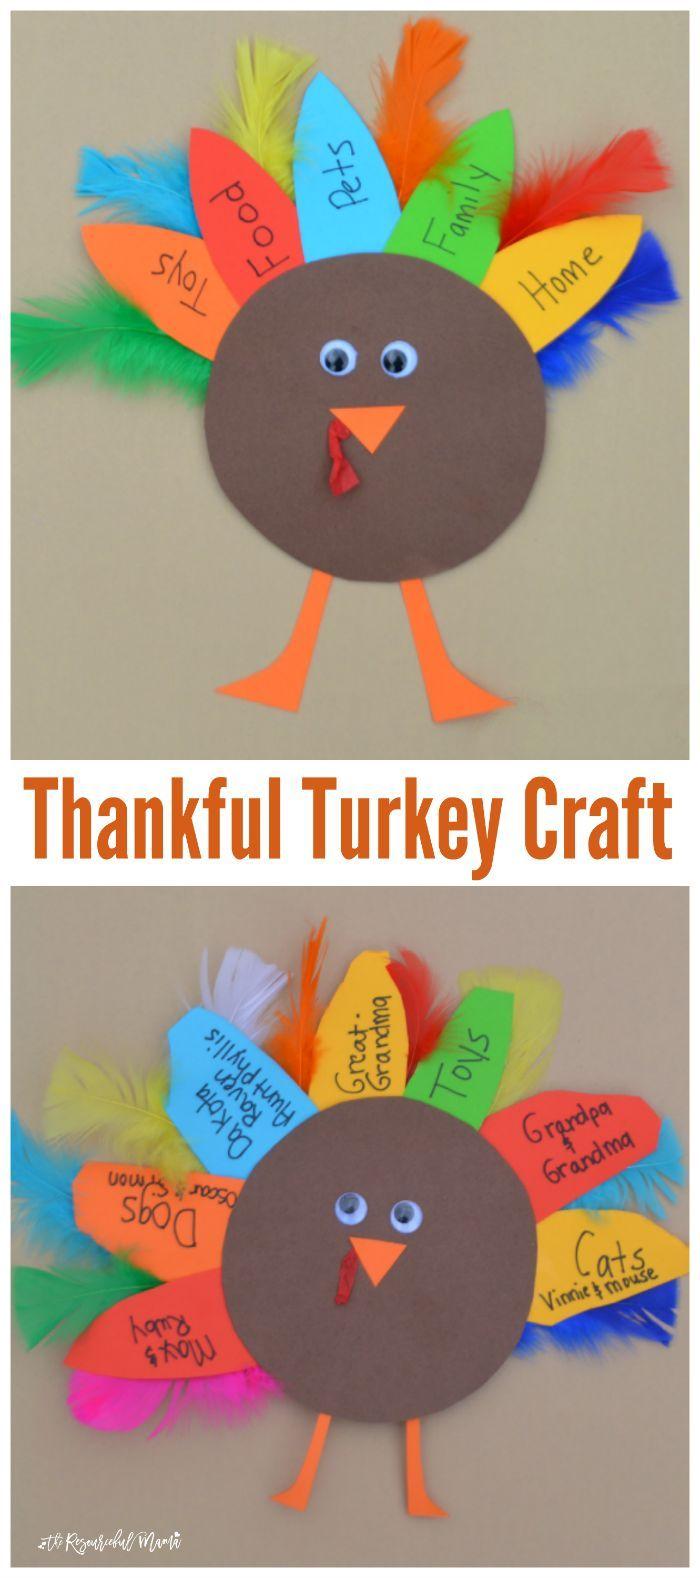 Thankful Turkey Kid Craft And Book Turkey Crafts Kids Thanksgiving Crafts For Kids Thanksgiving Crafts